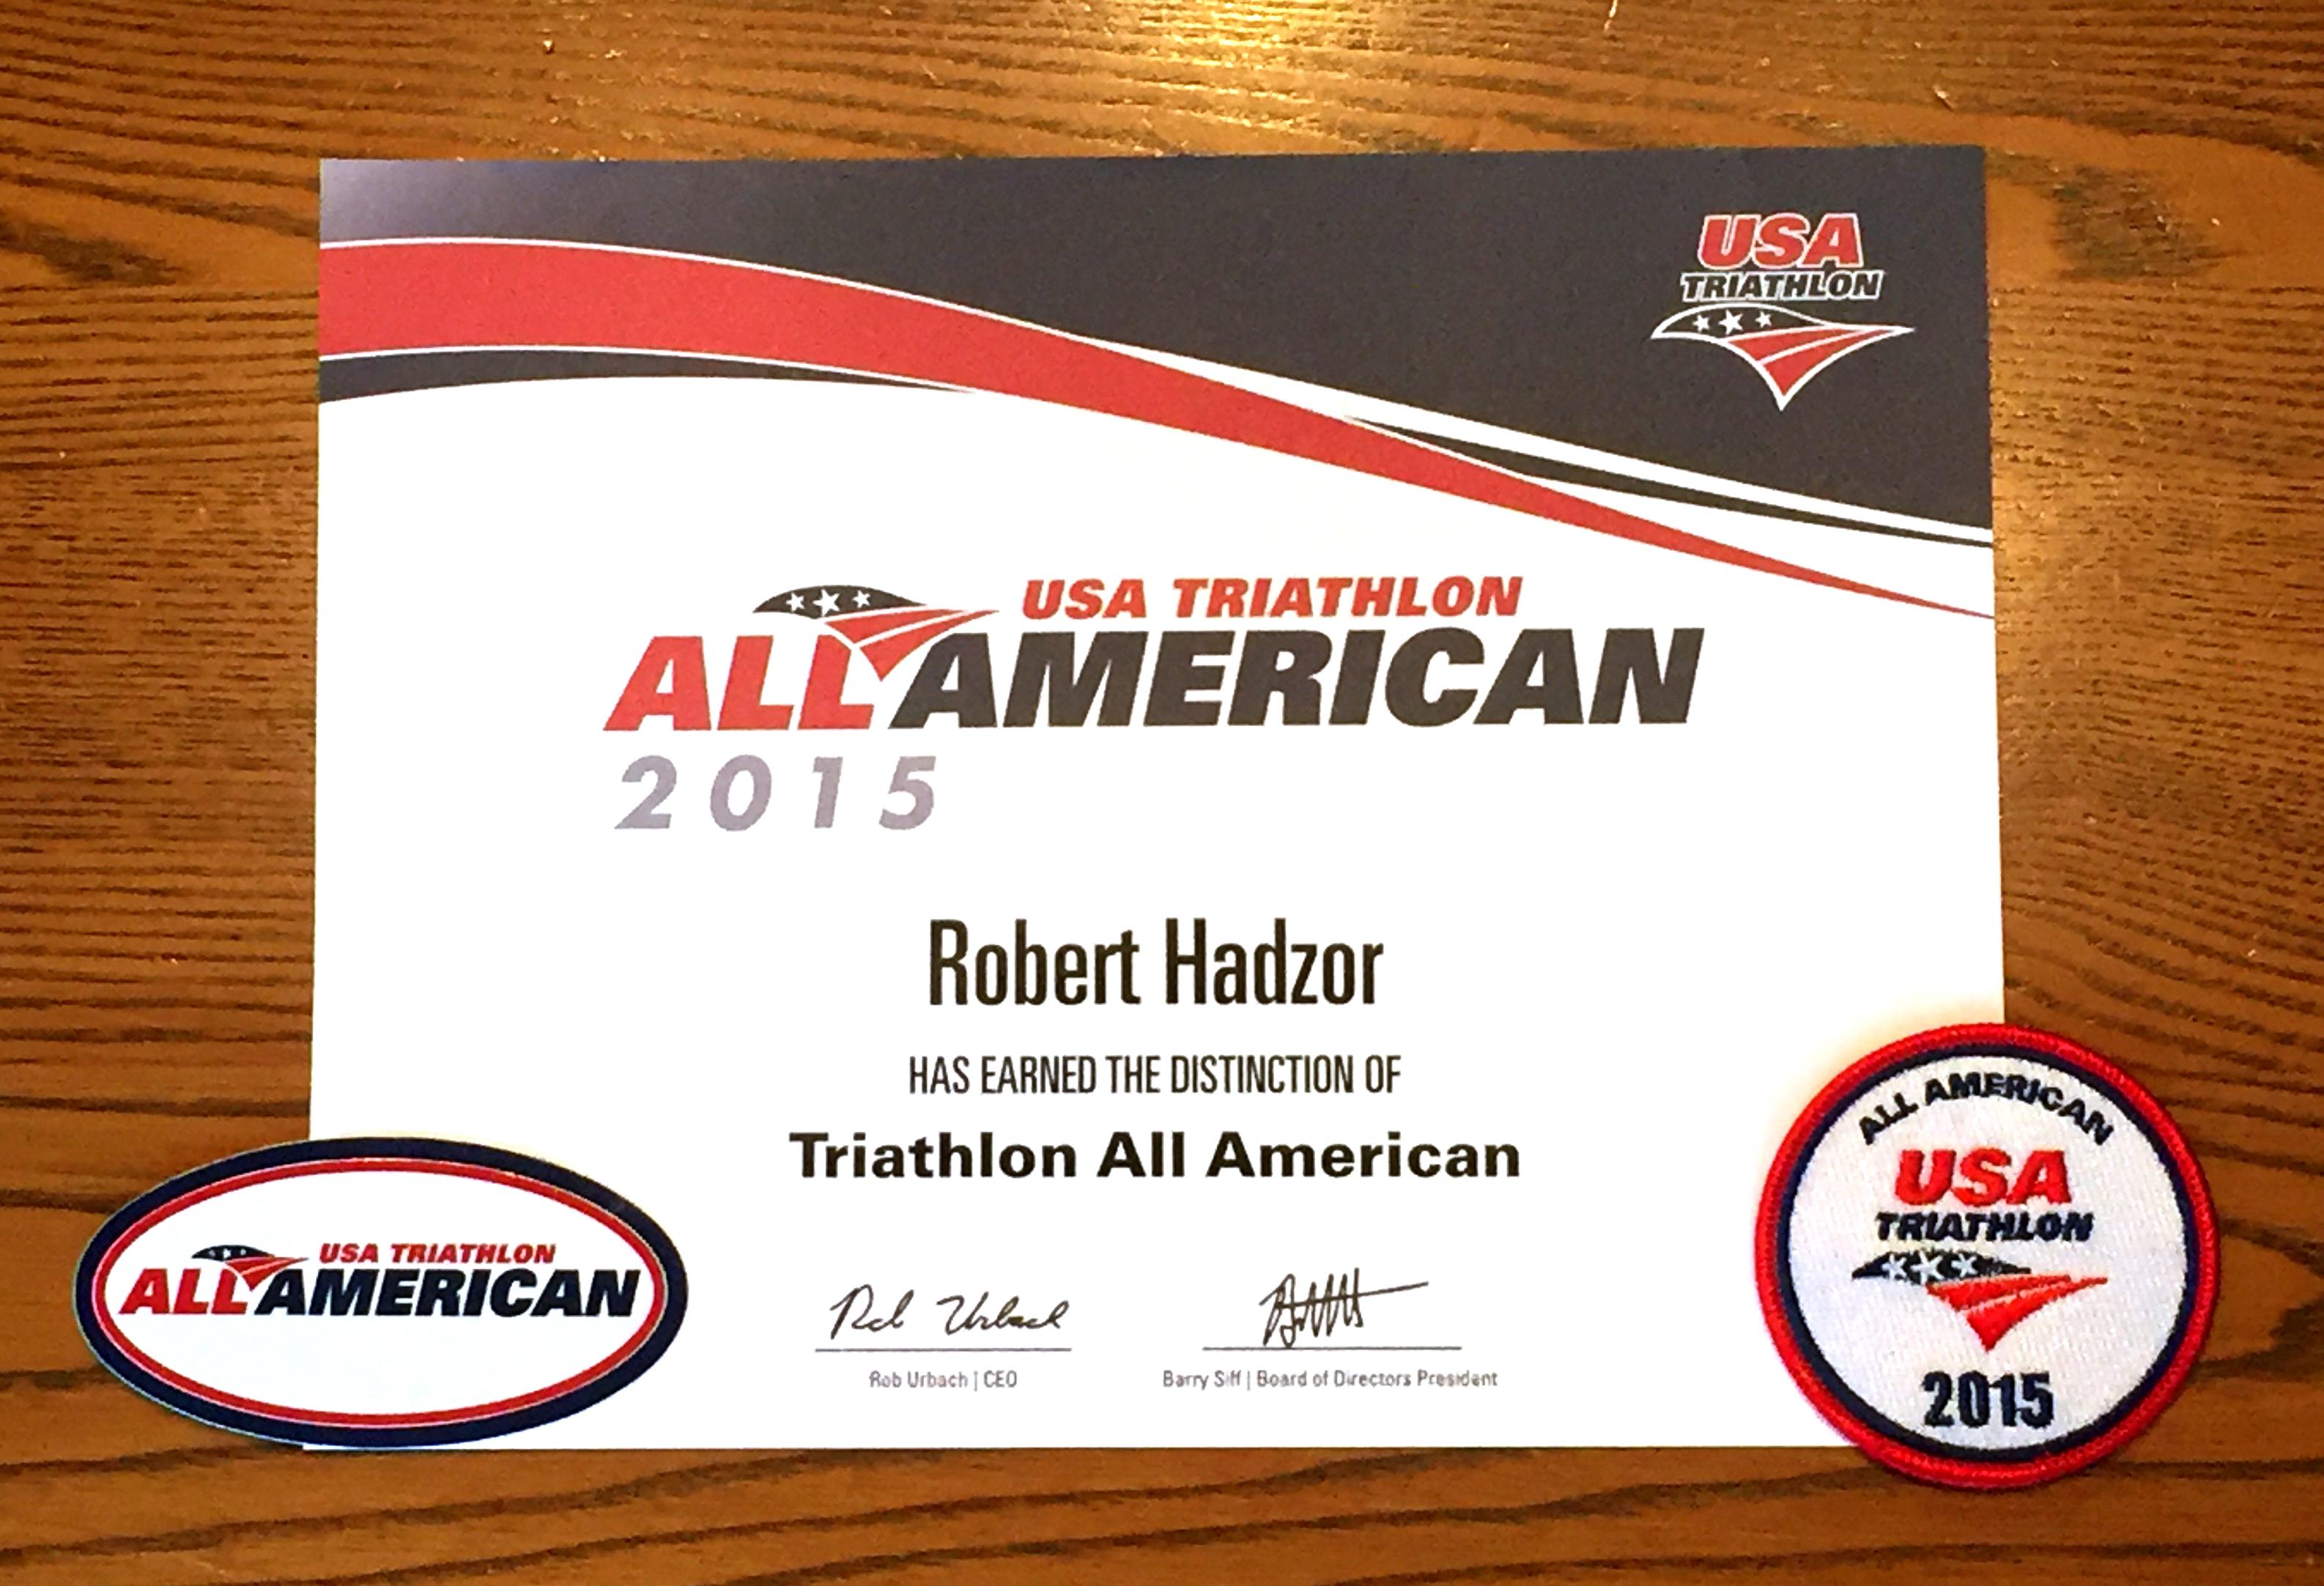 2015_TriAllAmerican_RobertHadzor